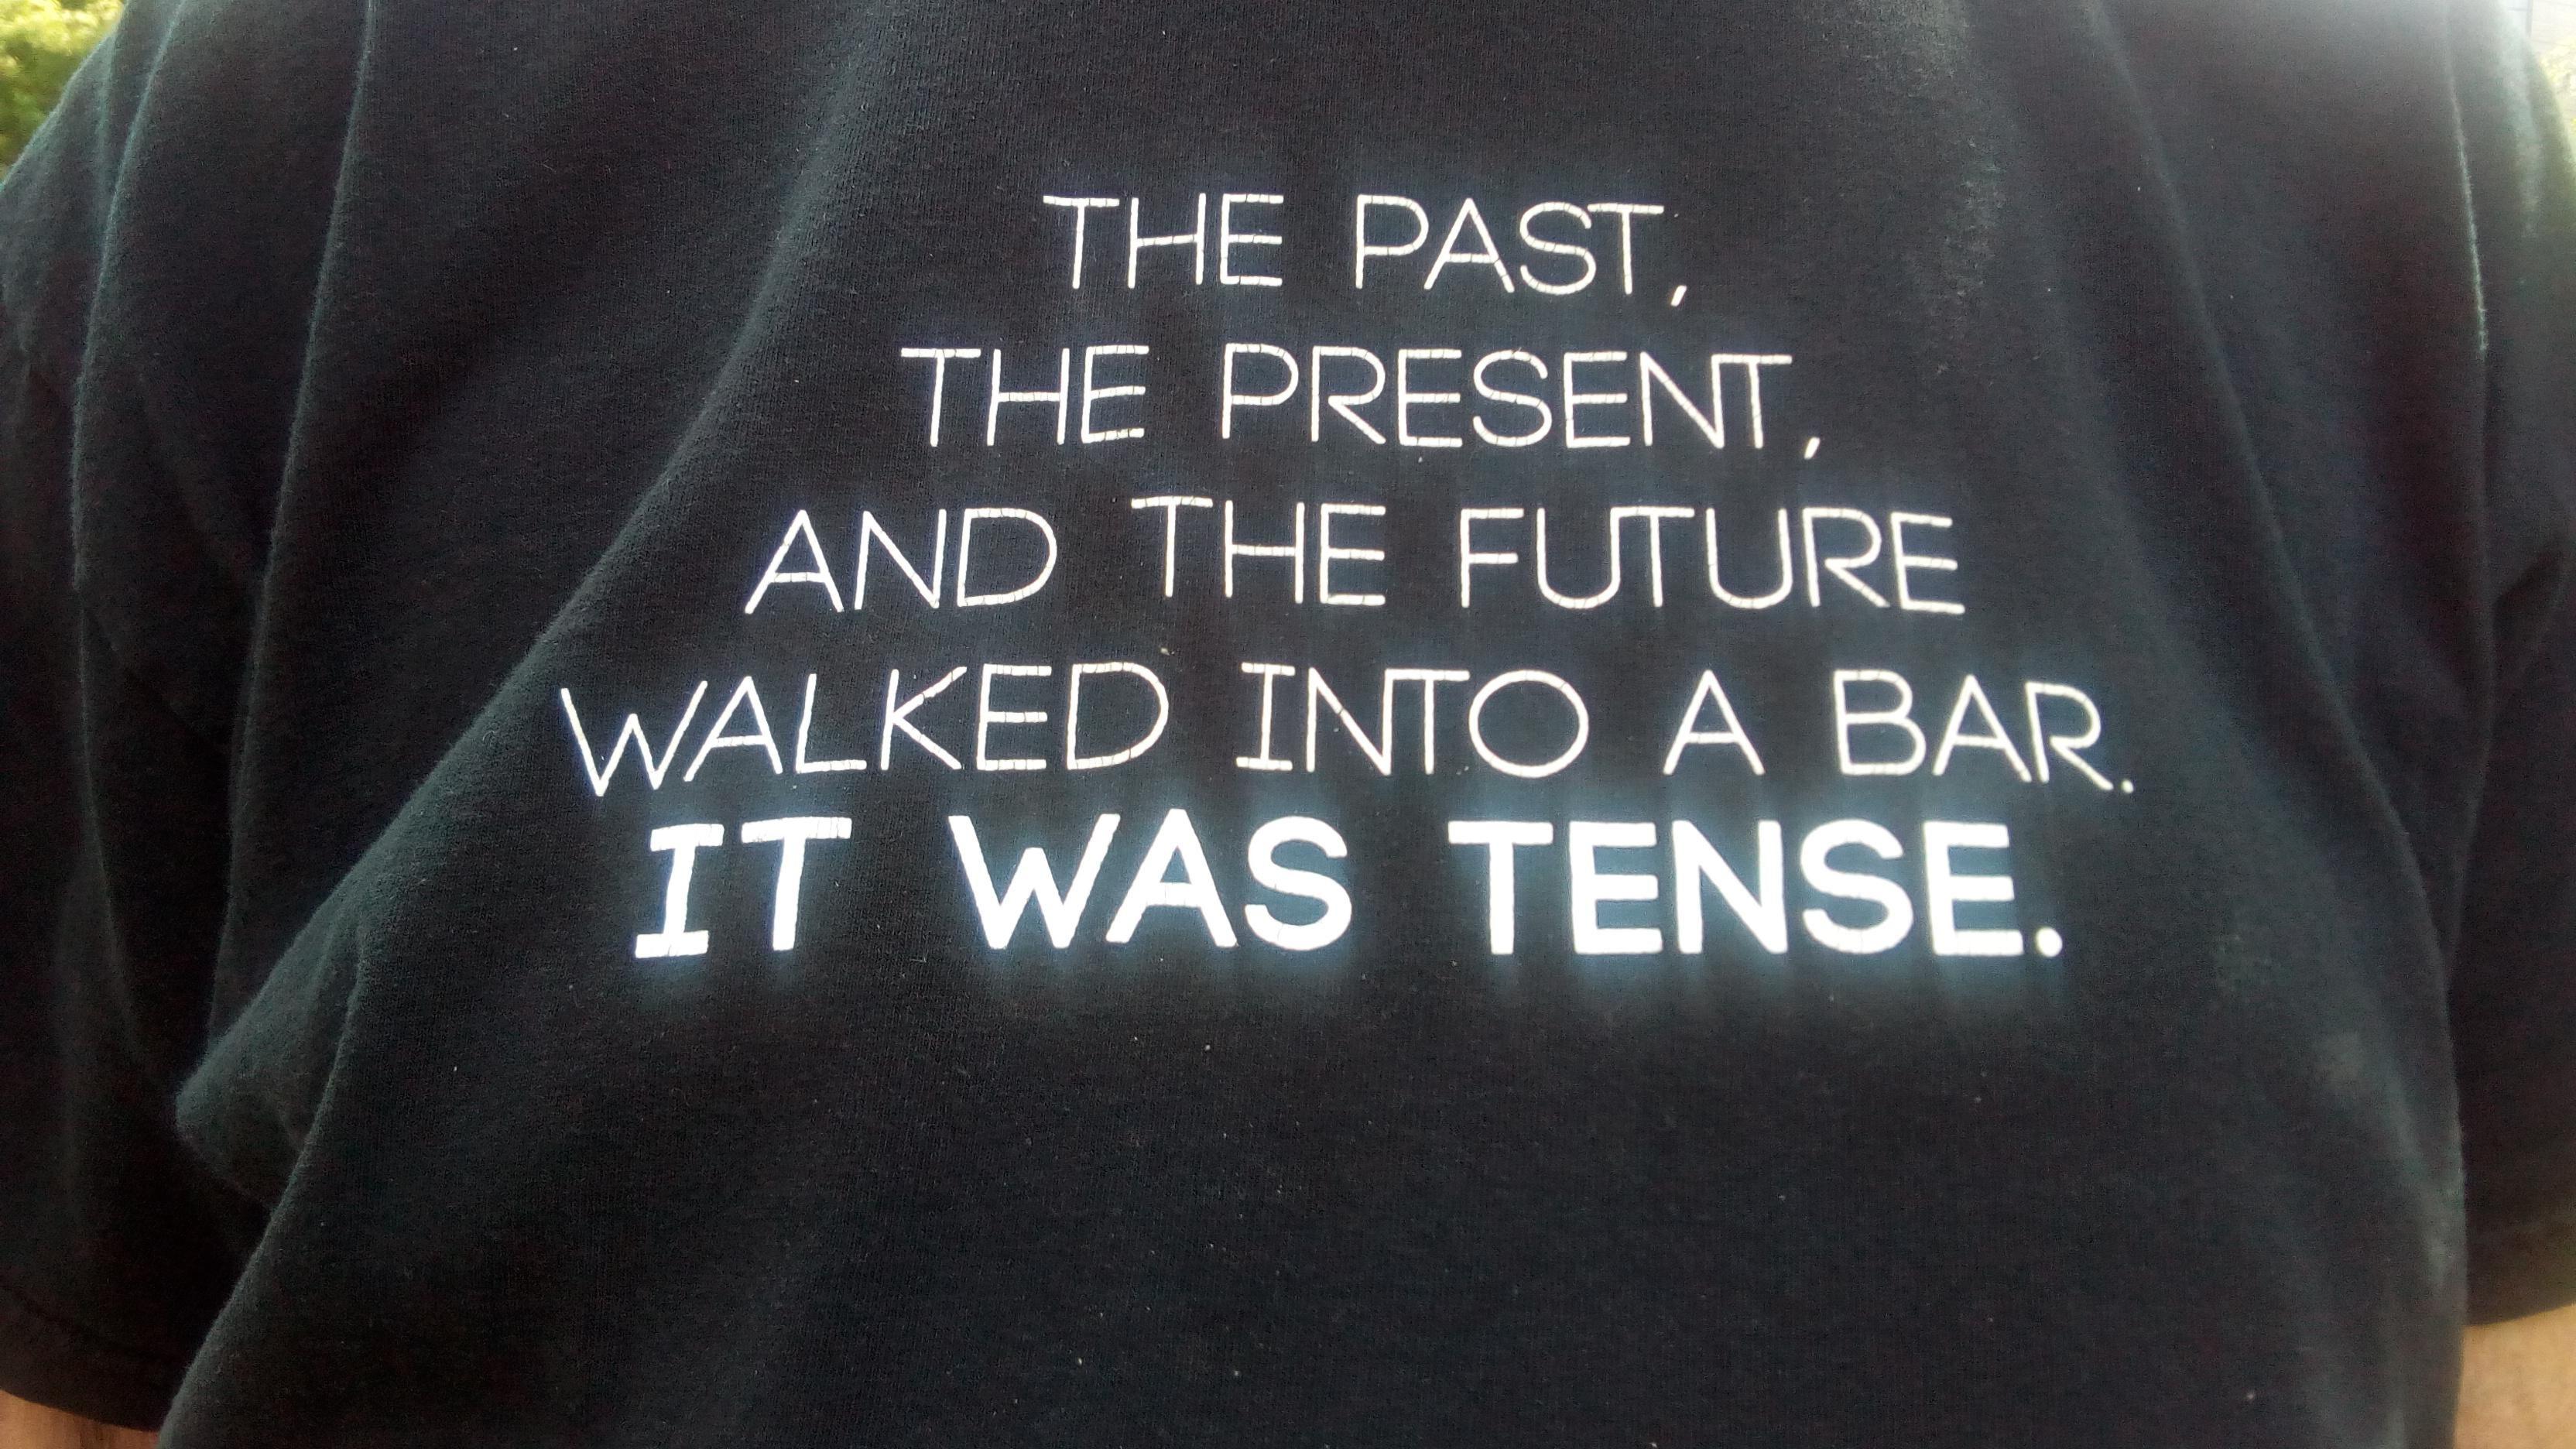 This shirt..